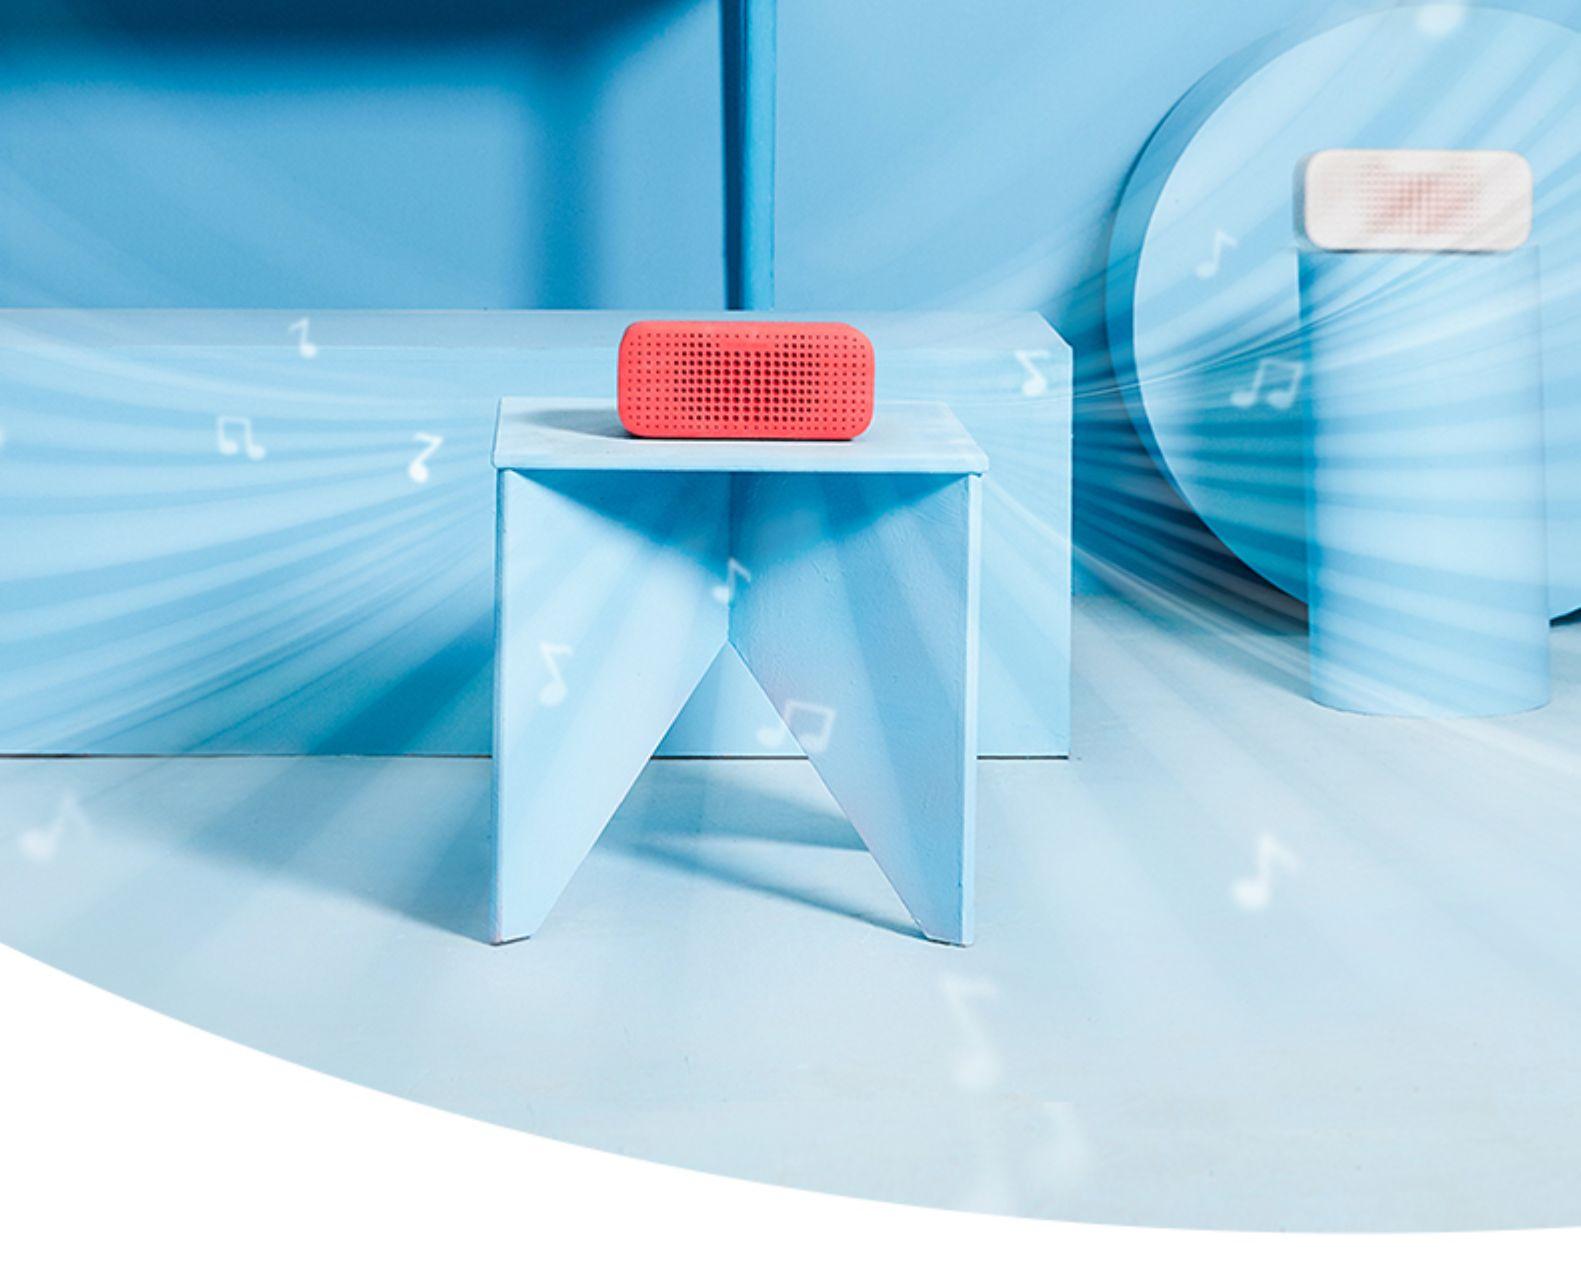 Loa Bluetooth Tmall Genie Bluetooth speaker smart speaker + Voice bulb